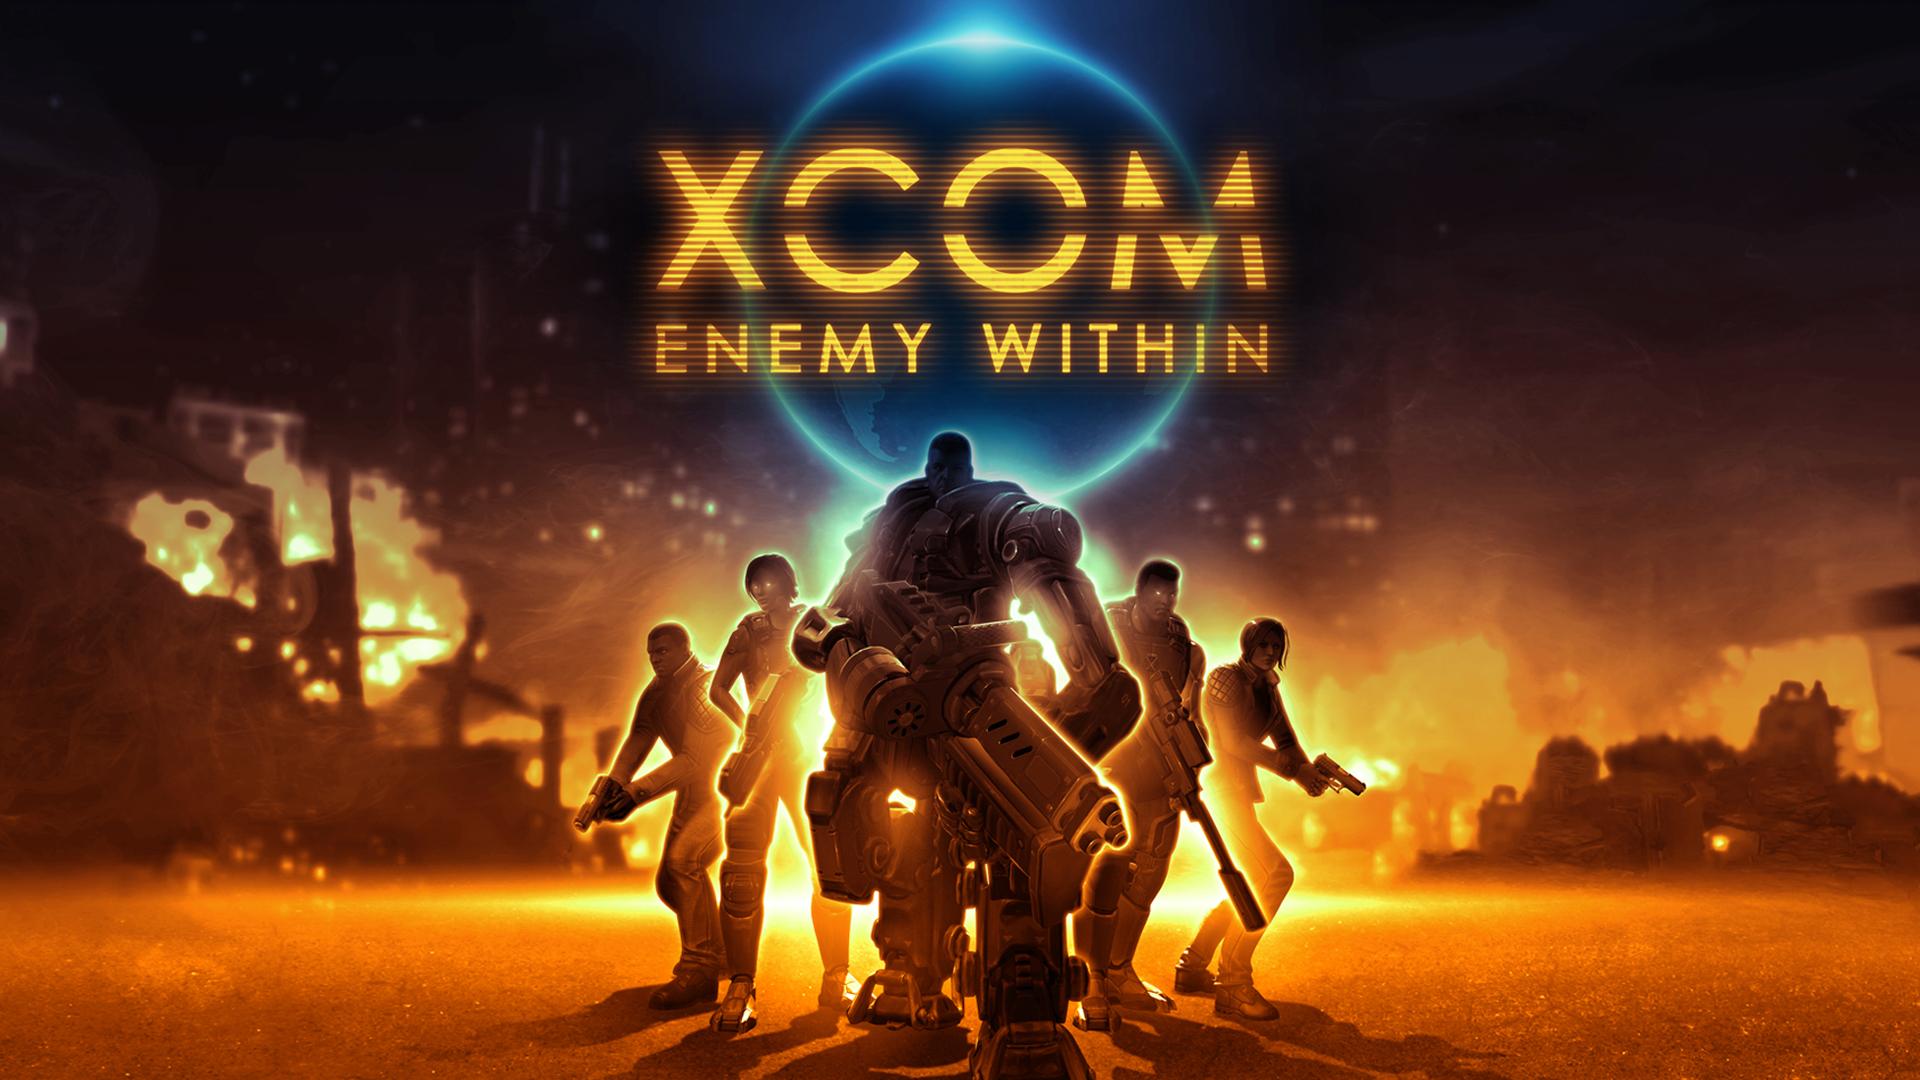 XCOM Enemy Within 01